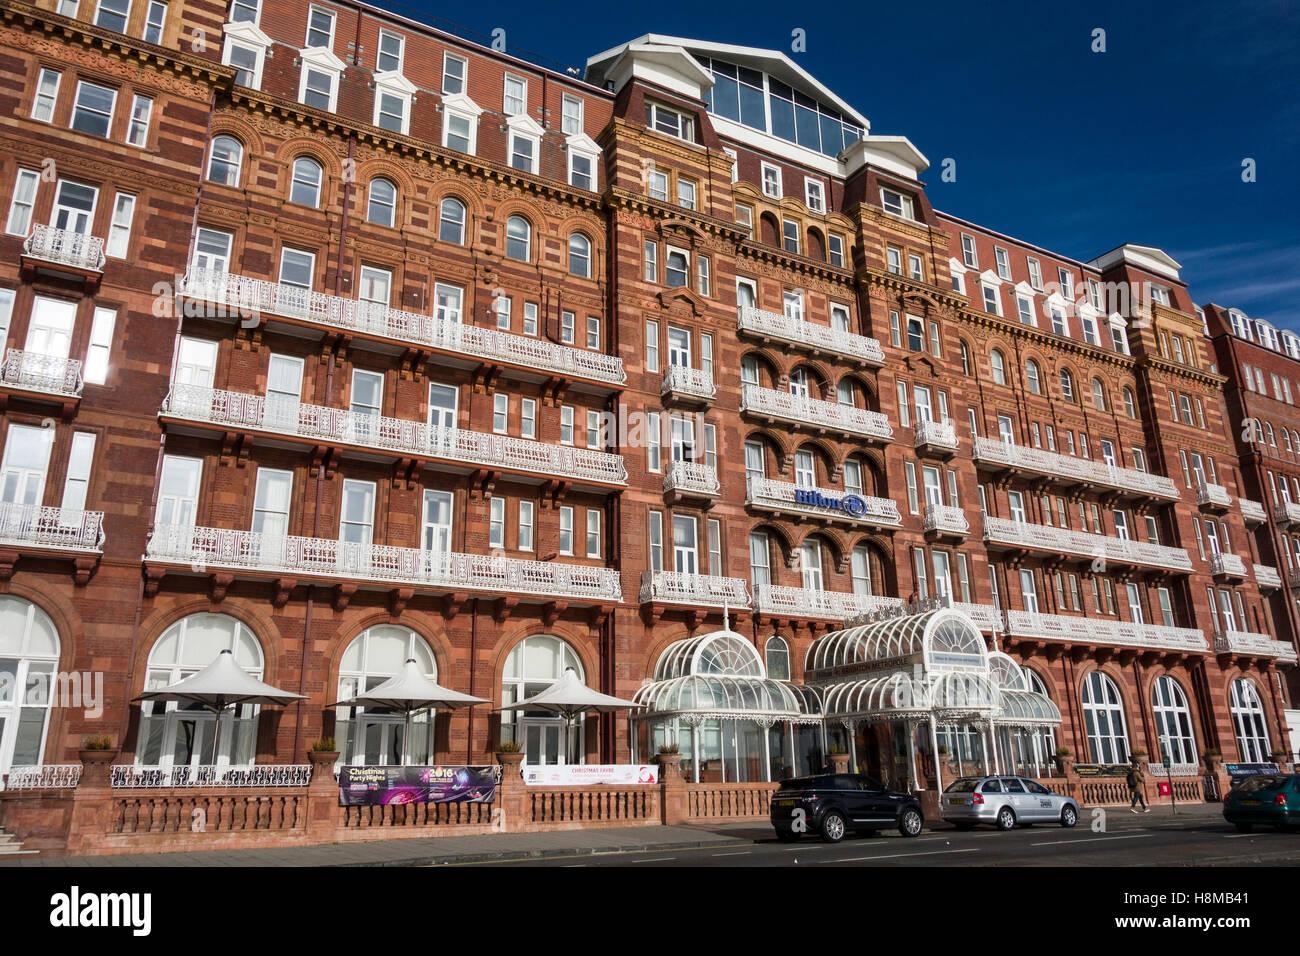 Hilton Brighton Metropole Hotel (erbaut 1890), Brighton, Sussex, England UK Stockbild